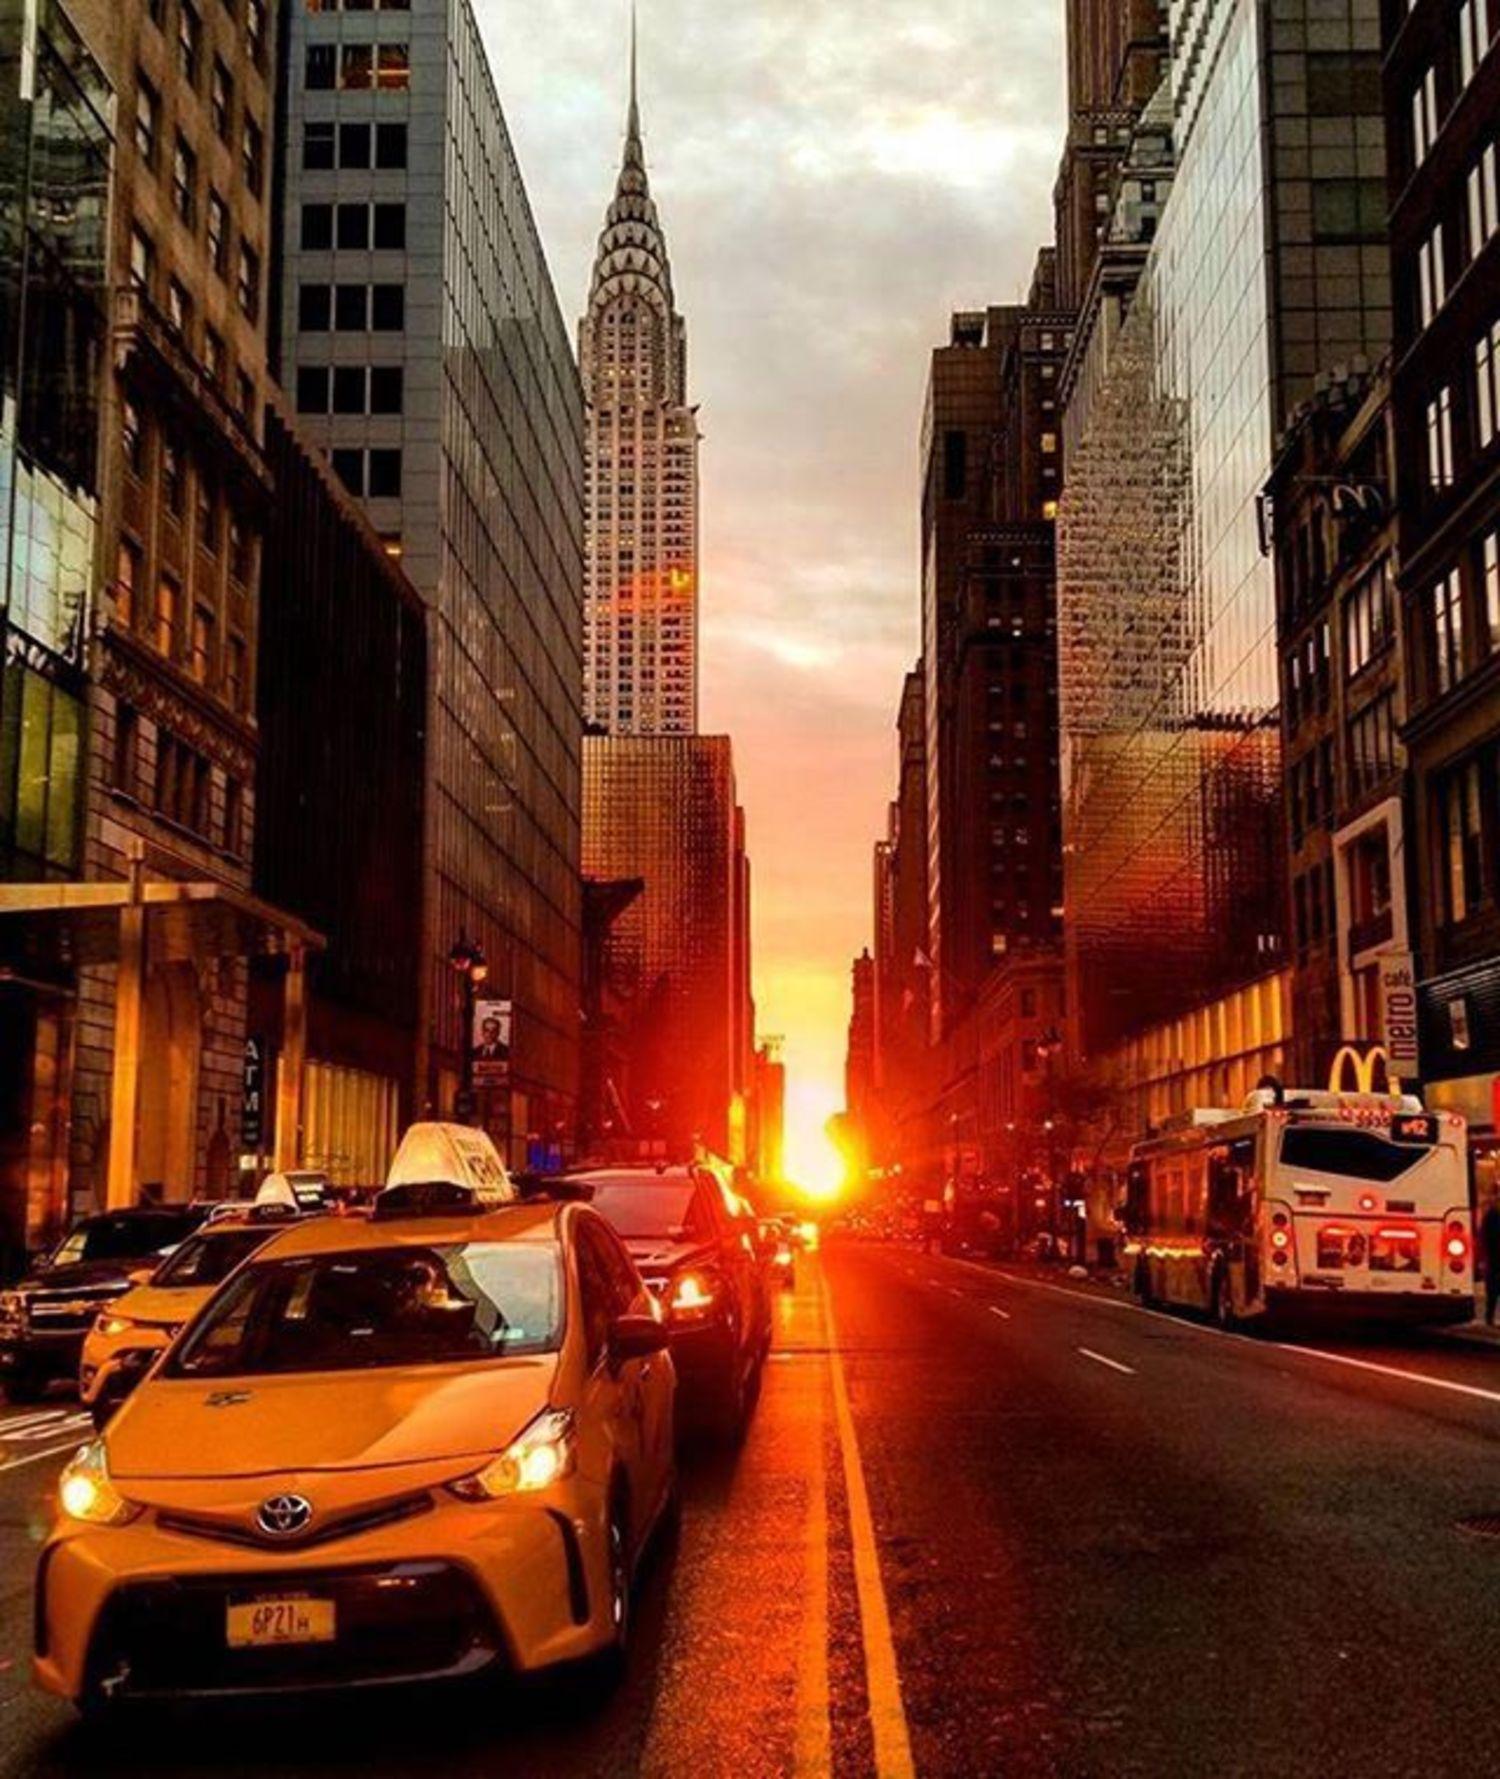 Sunrise on 42nd St. New York, New York. Photo via @qwqw7575 #viewingnyc #newyork #newyorkcity #nyc